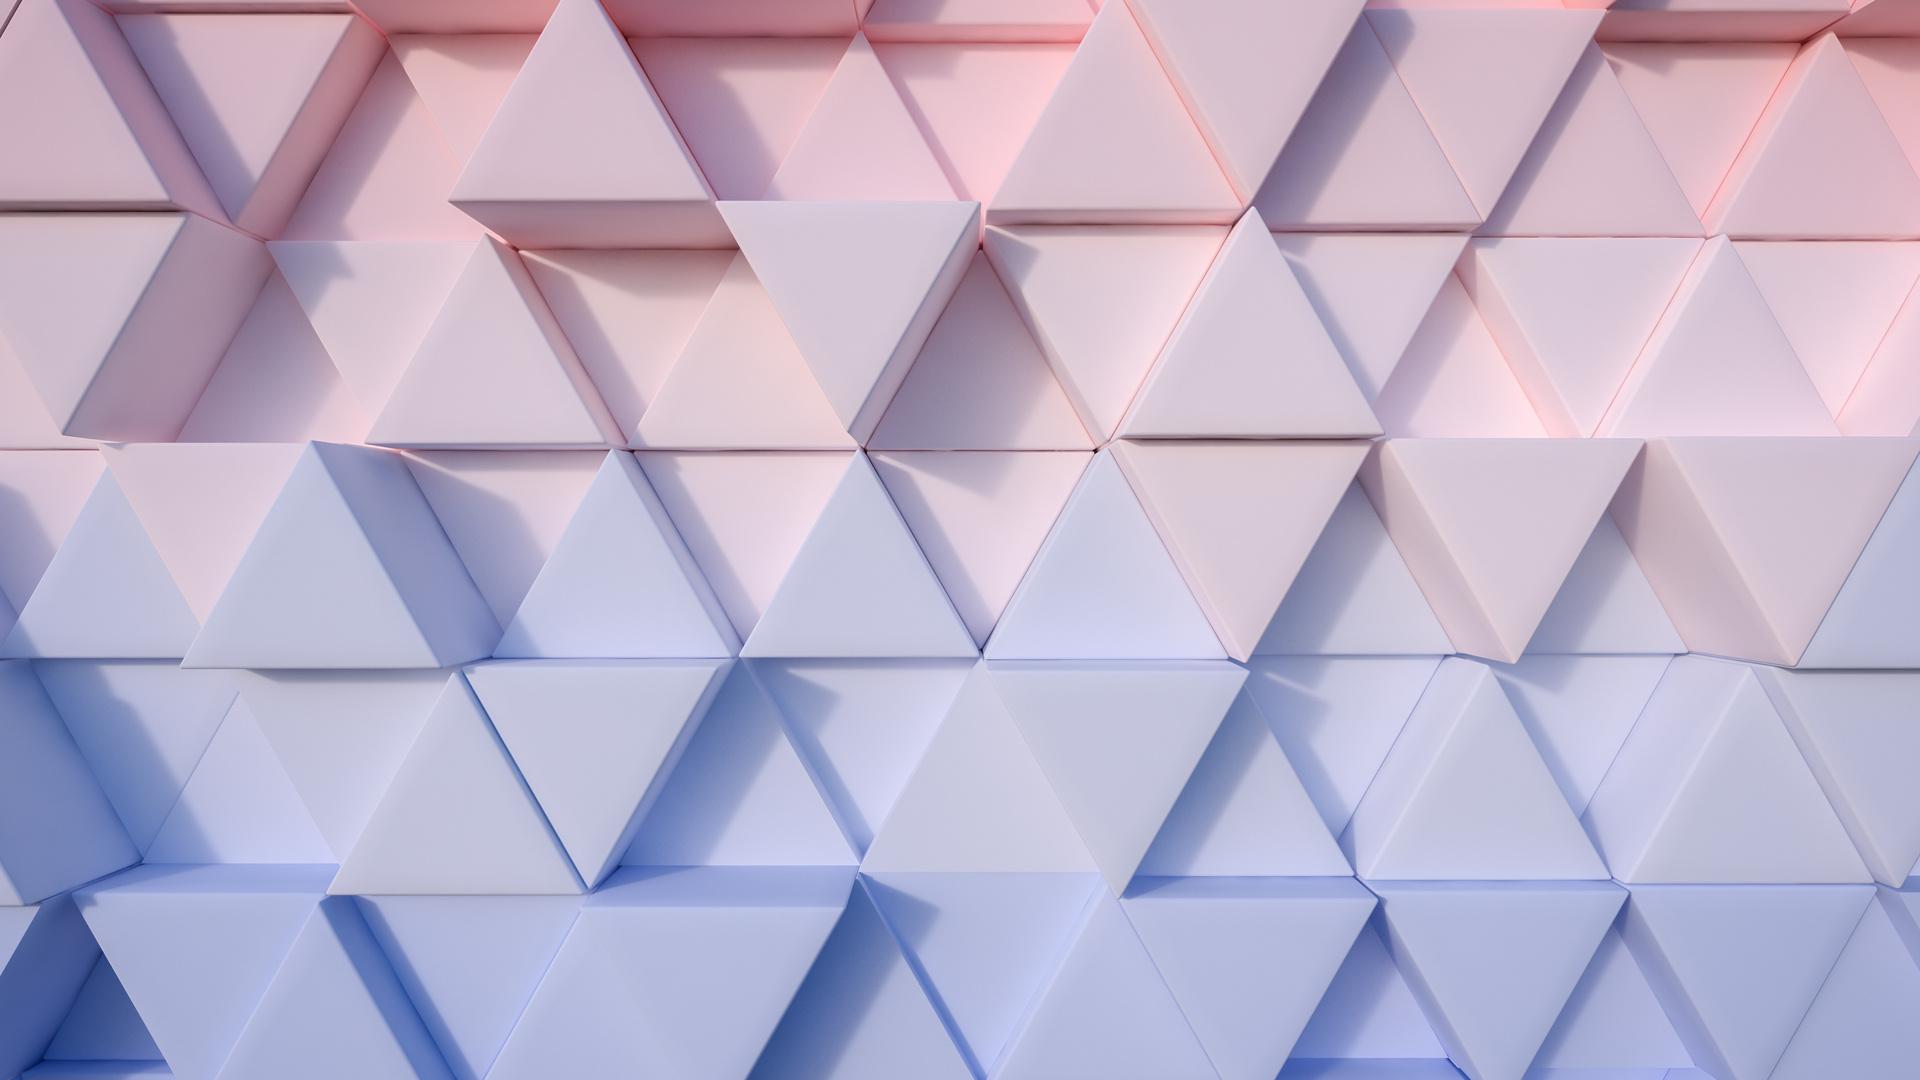 triangle-pastel-3d-4k-0d.jpg